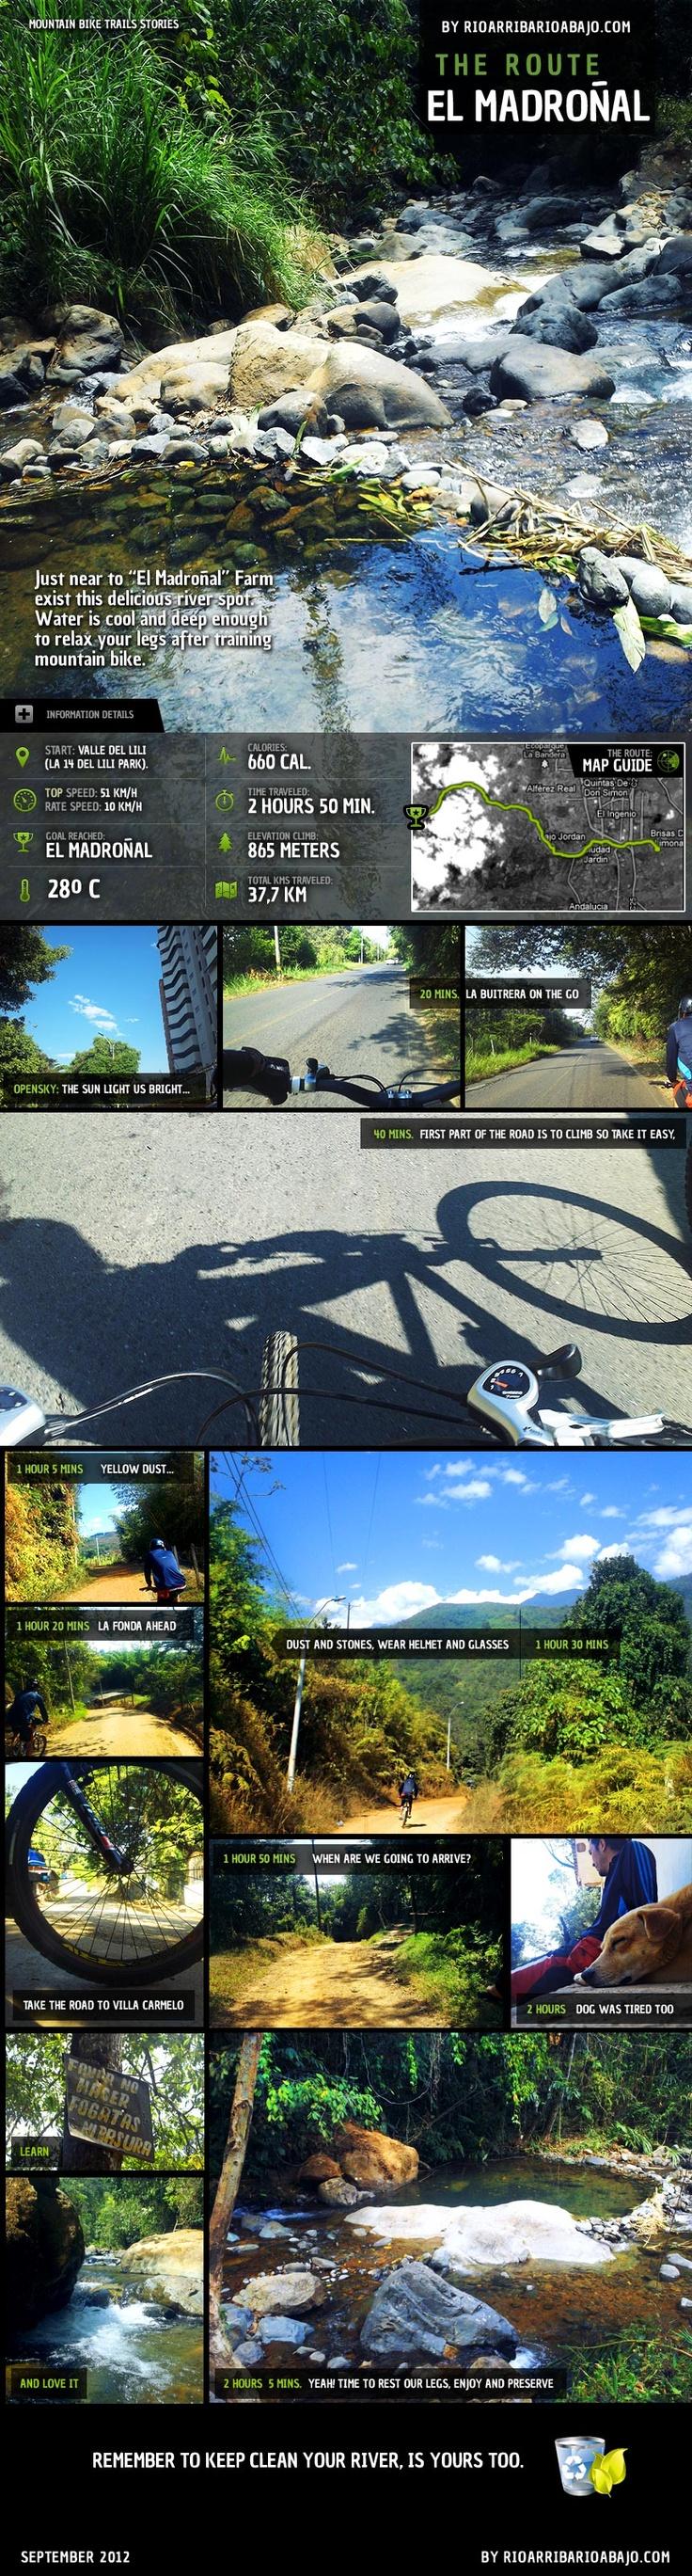 "Ruta ""El Madroñal"", river spot for mountain bikers"